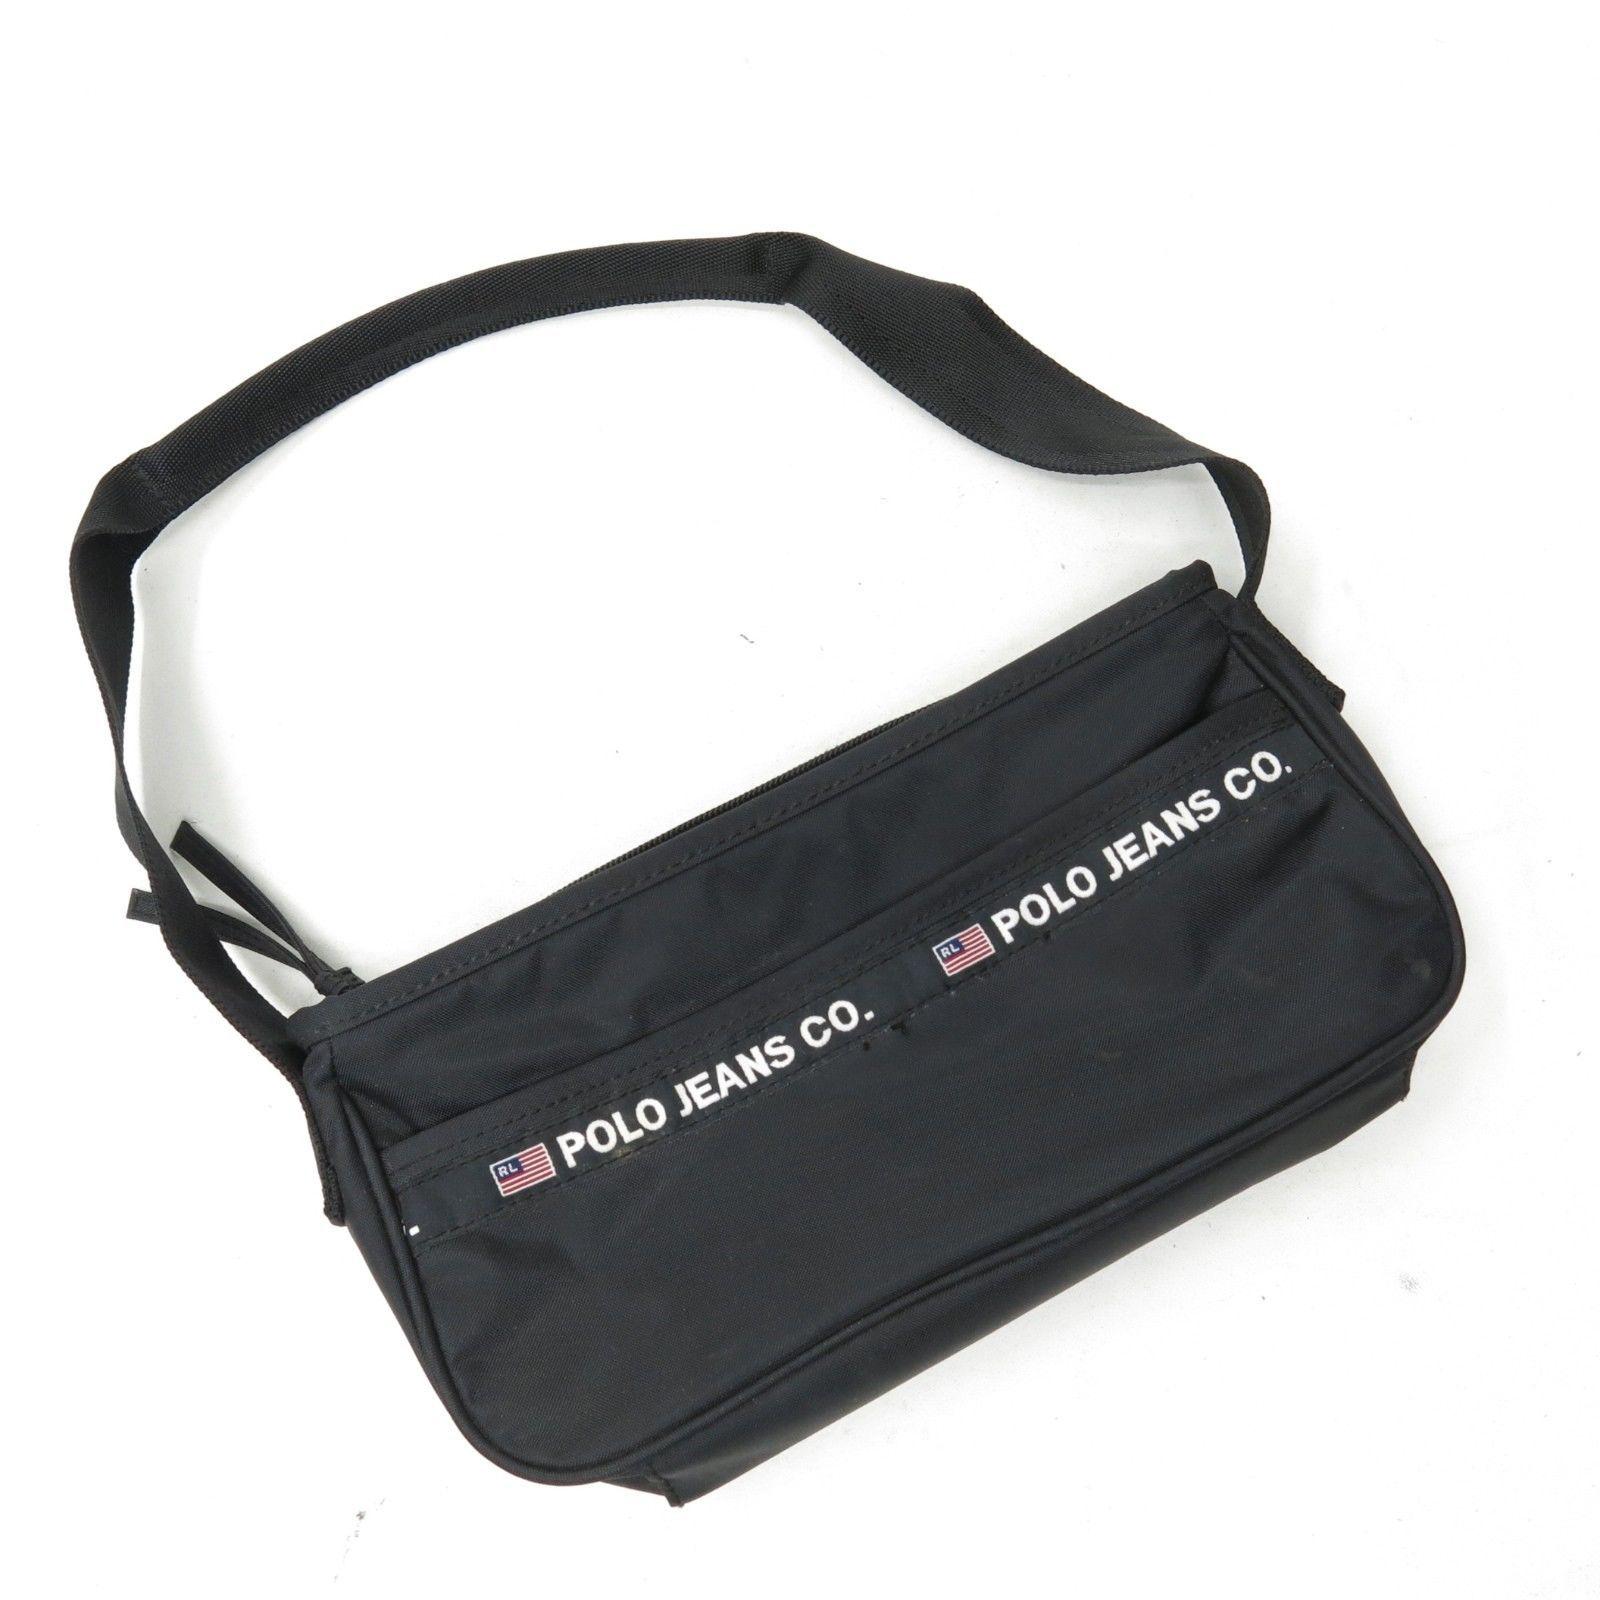 c83bd97a93db Vtg 90s Ralph Lauren Polo Sport Jeans Black Nylon Small Spellout Purse Bag